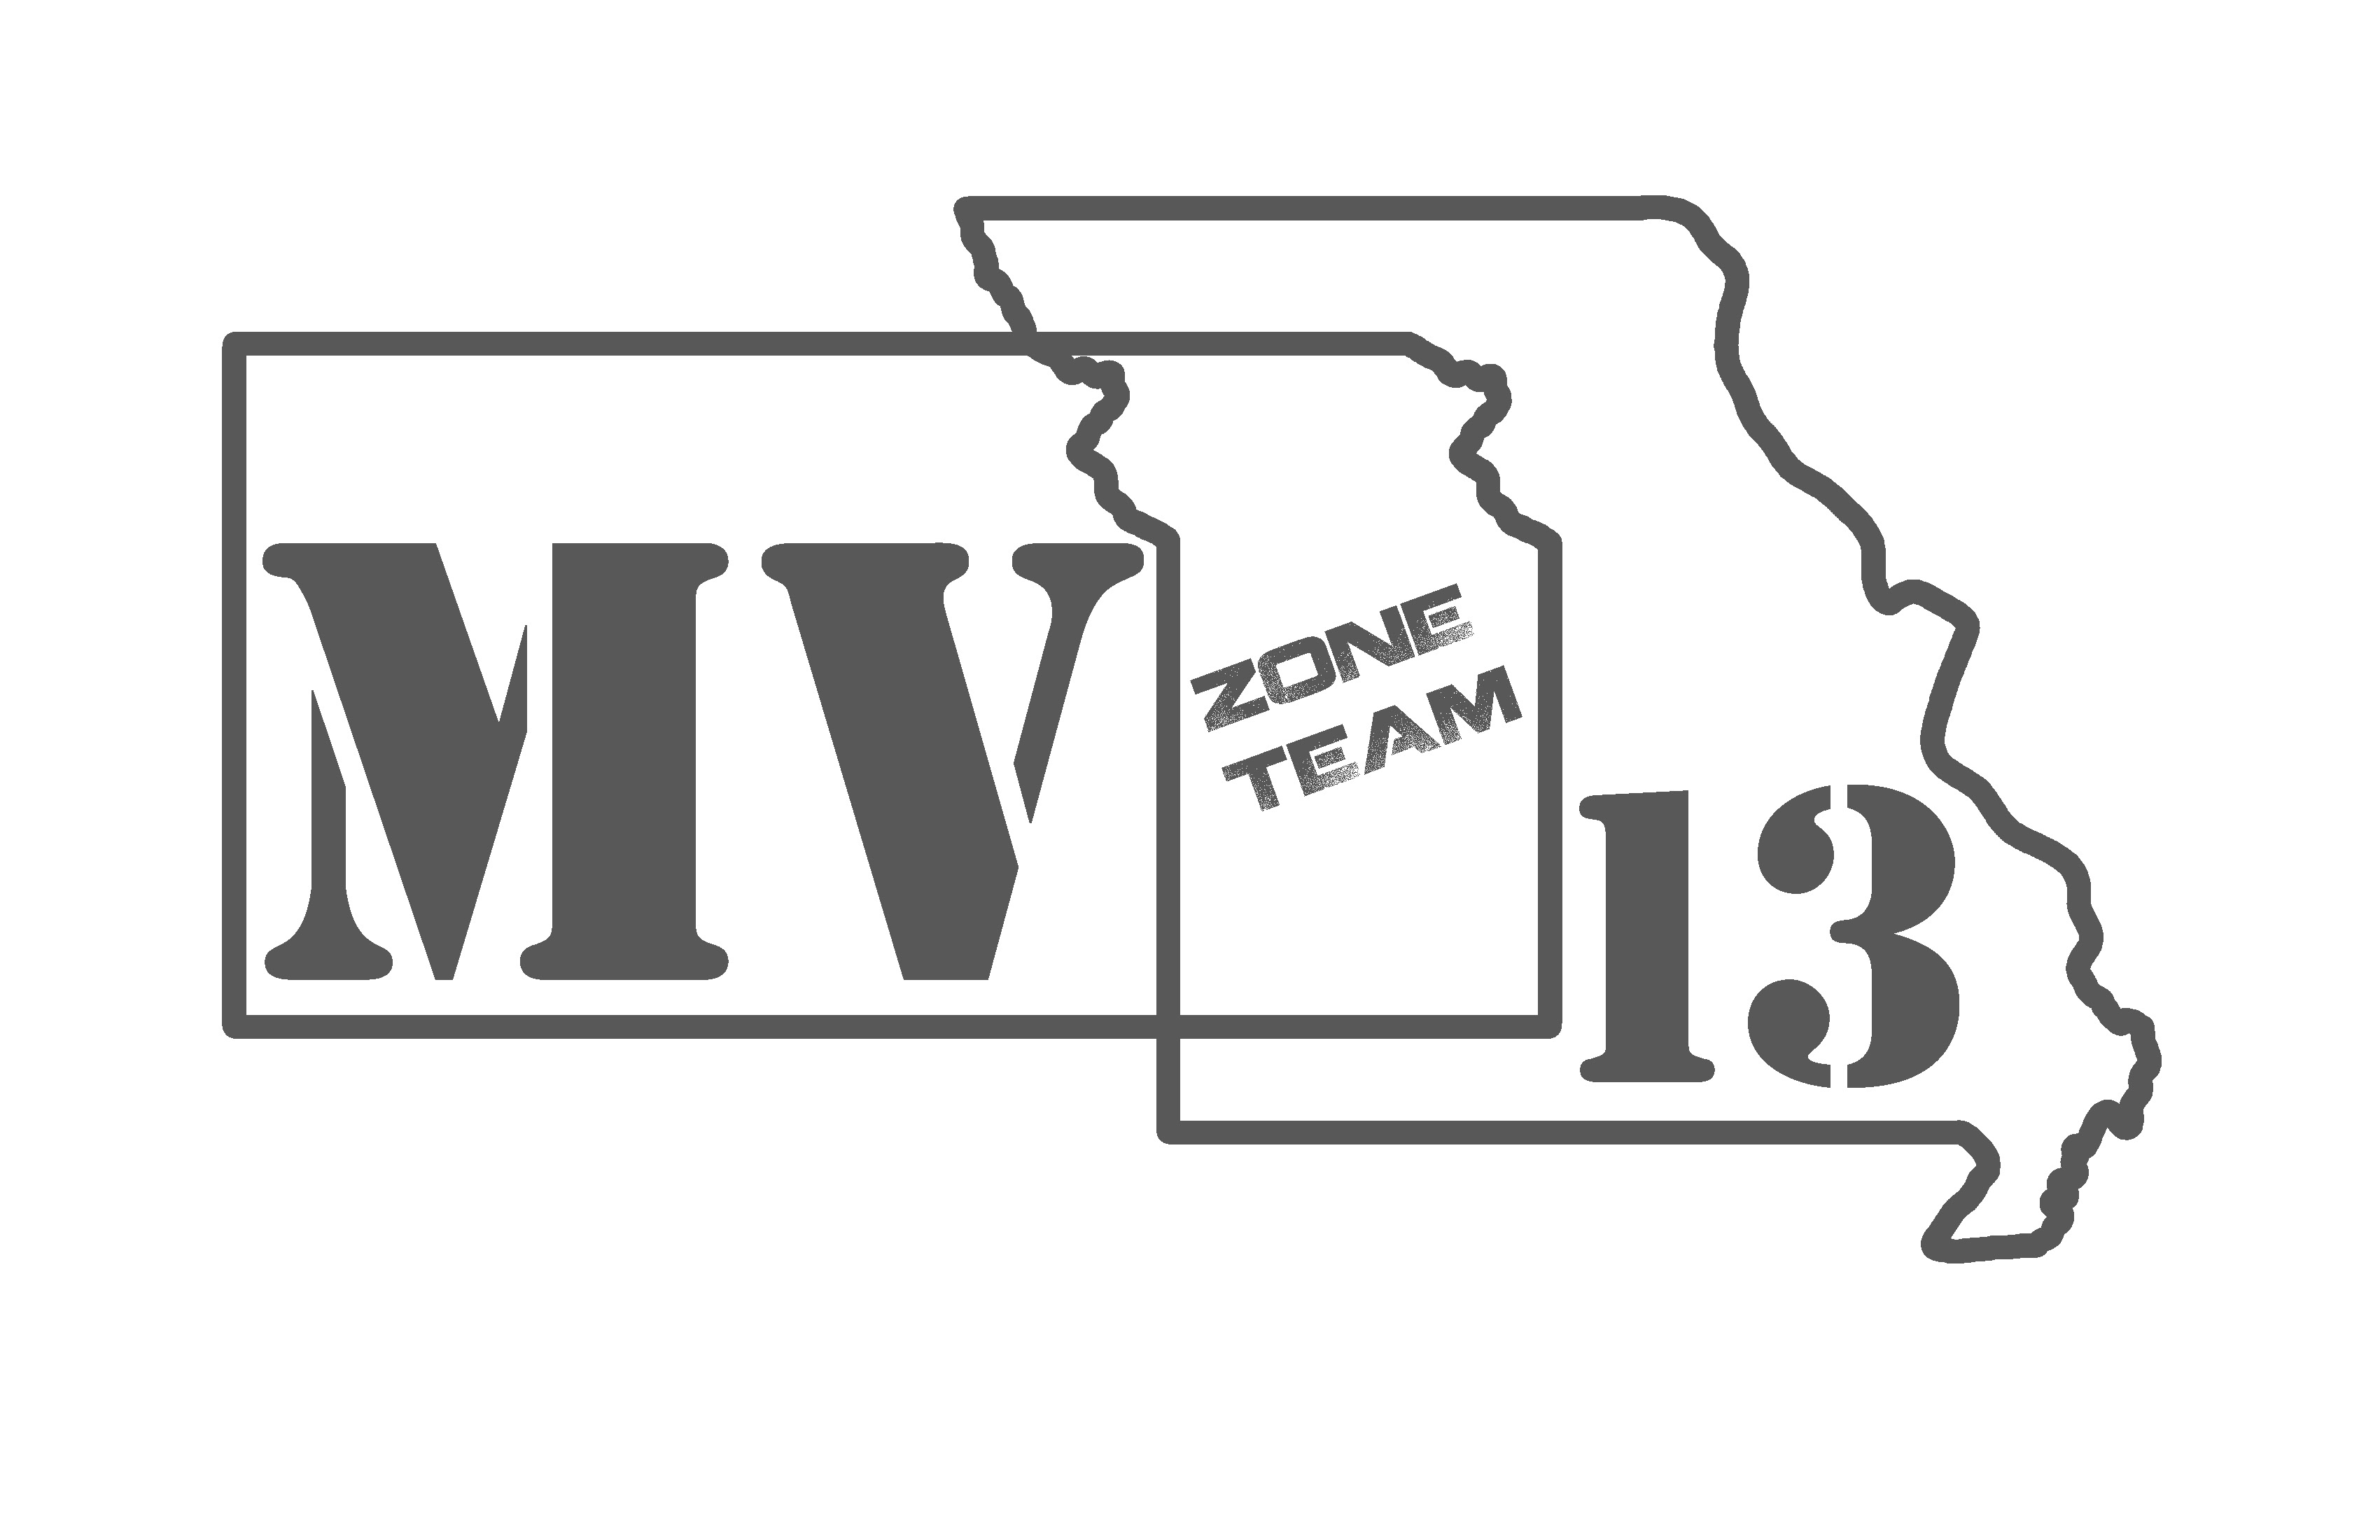 Missouri valley zone team E